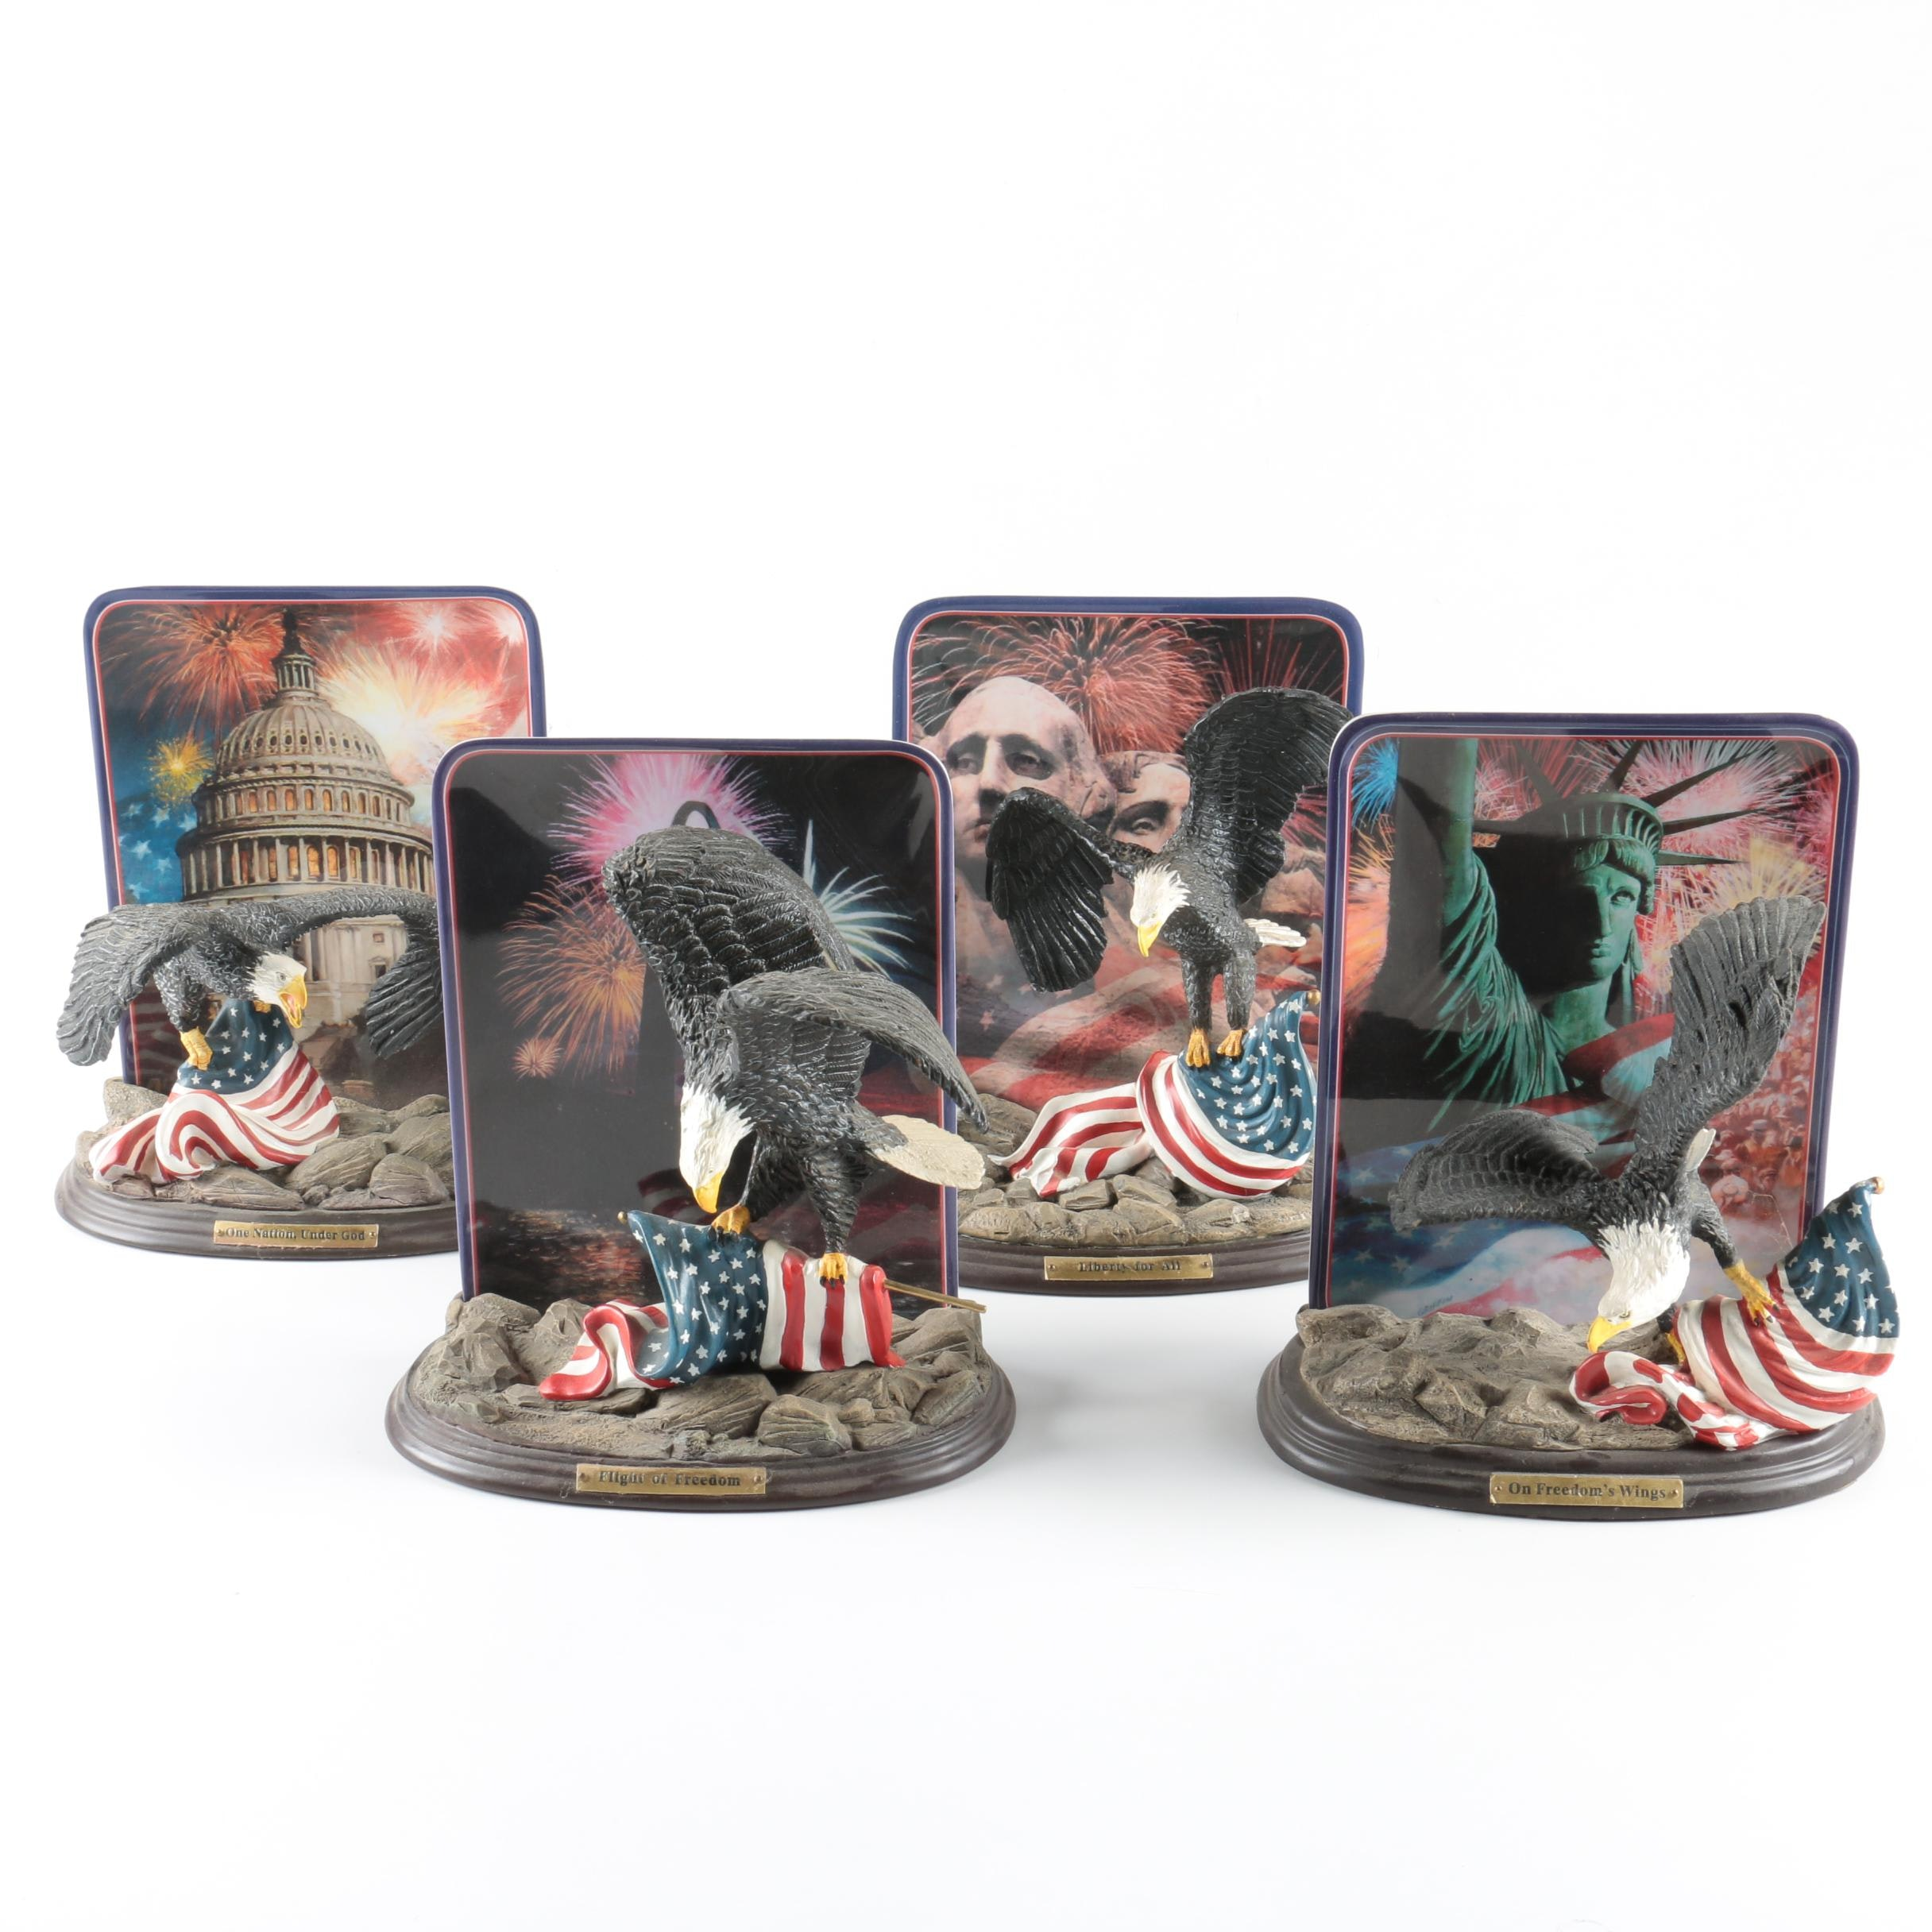 "Bradford Exchange ""Celebrating America's Glory"" Plate and Figurine Sets"